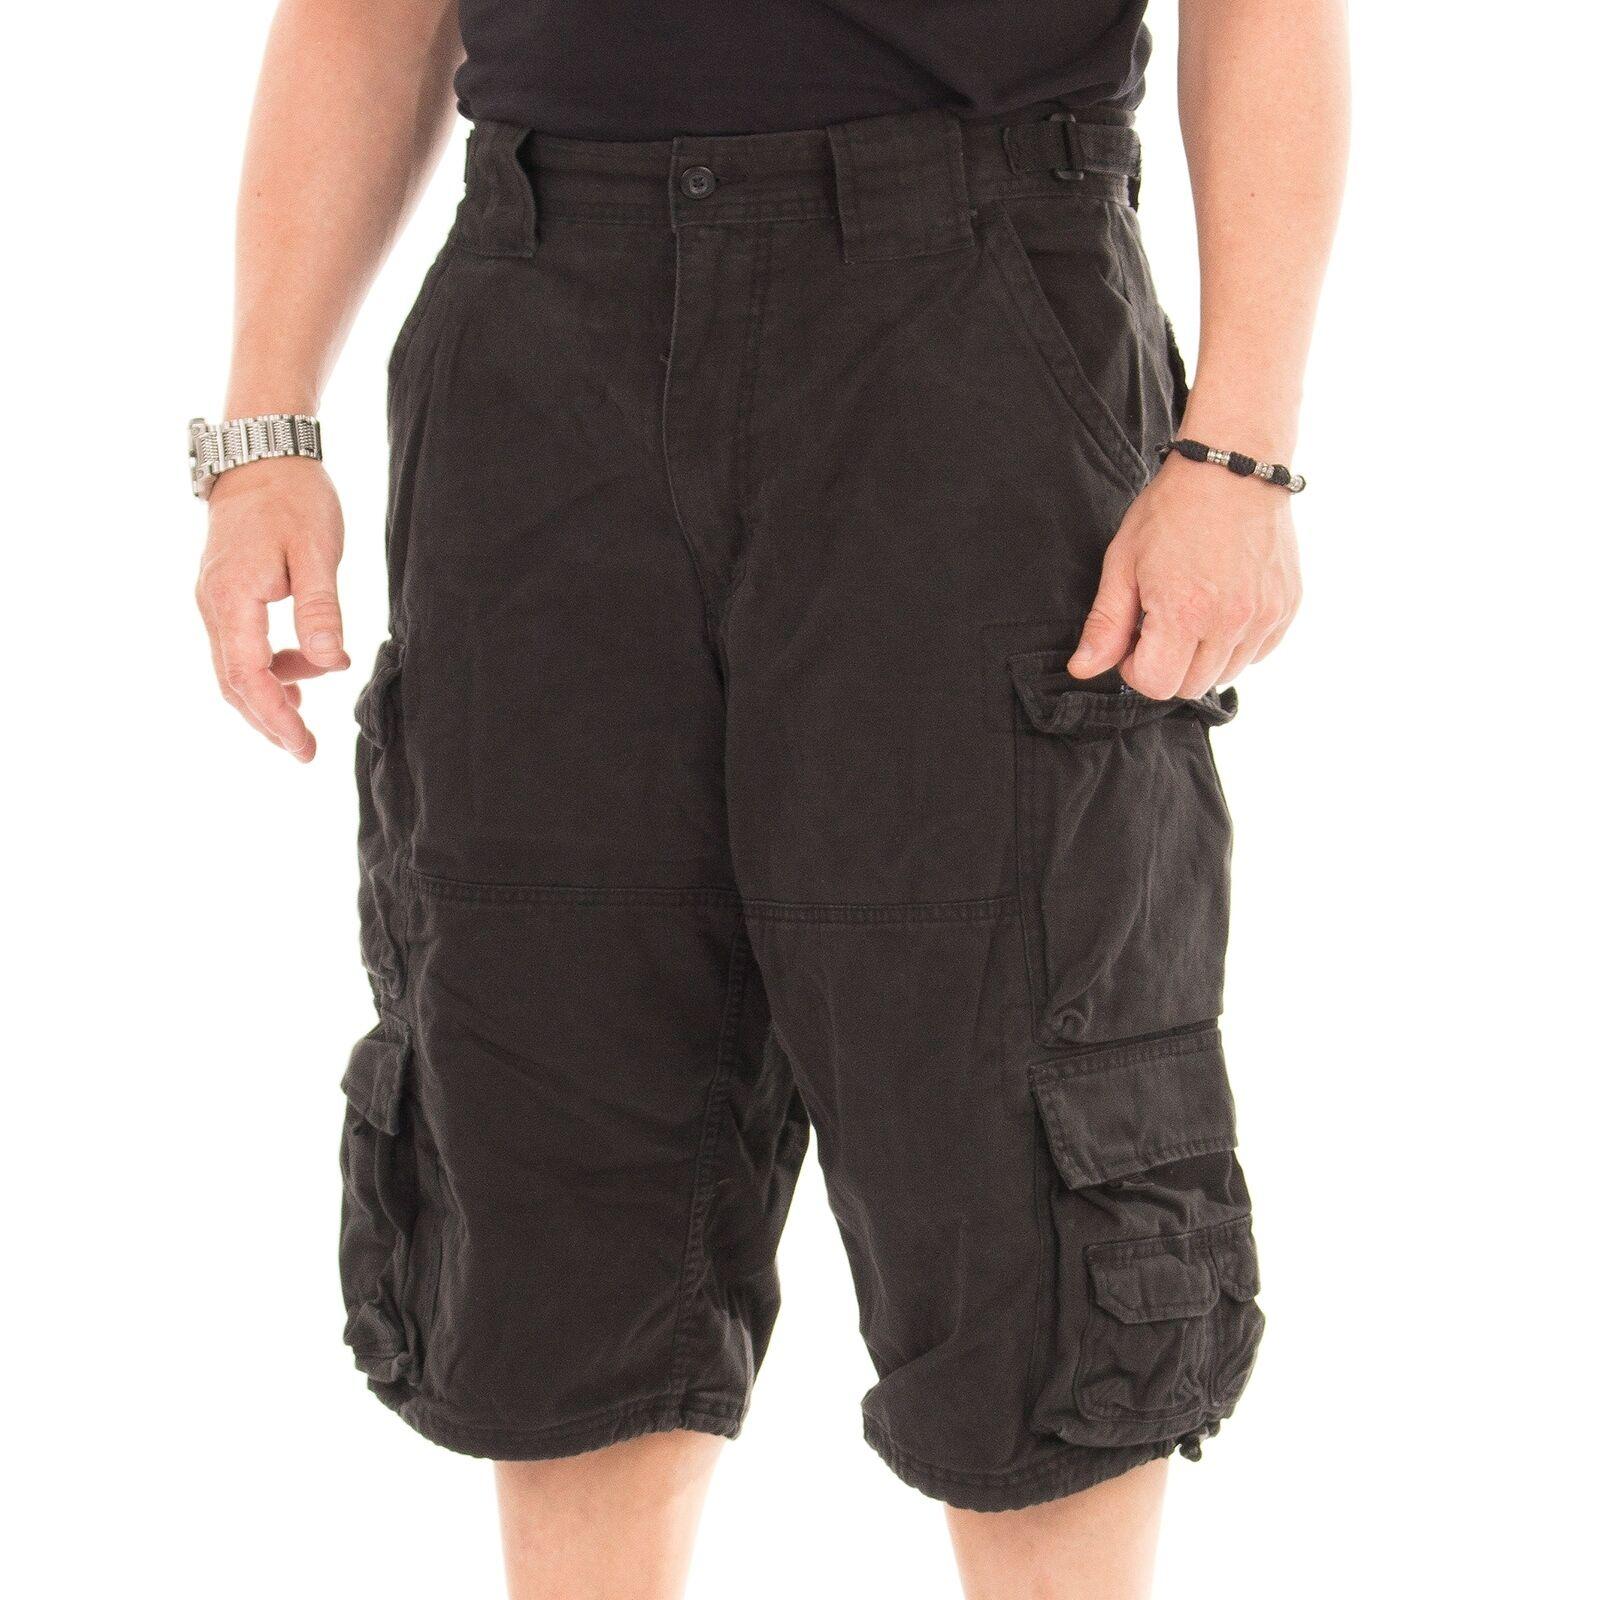 Jet Lag 007 B Short Herren kurze Hose Hose Hose Sommerhose Farbe schwarz 15242 7e3801